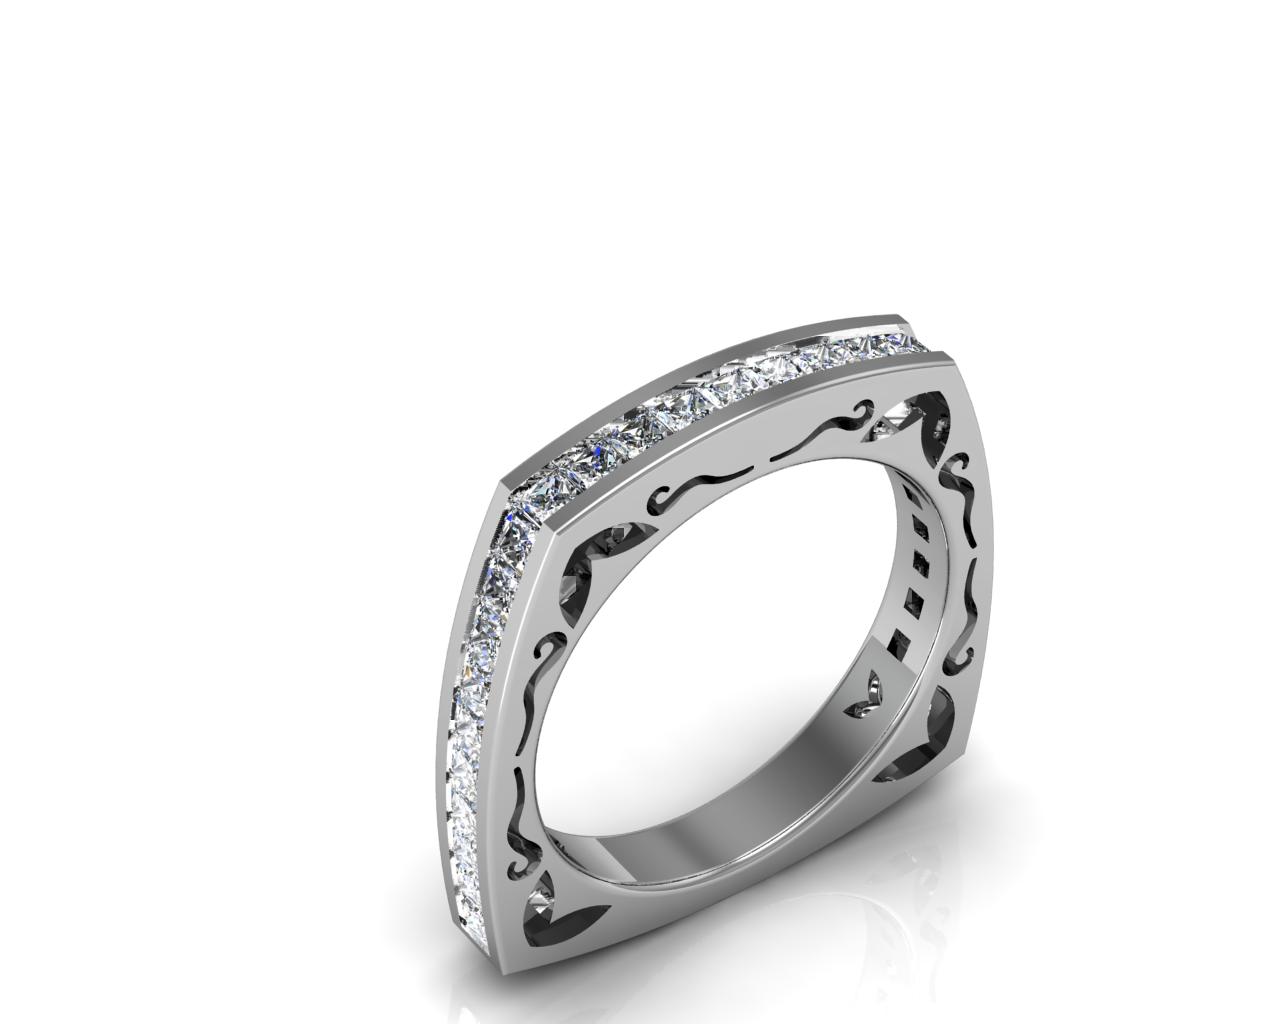 Diamond Nexus Releases Matching Wedding Bands For Michael Nashef Designer Affordable Engagement